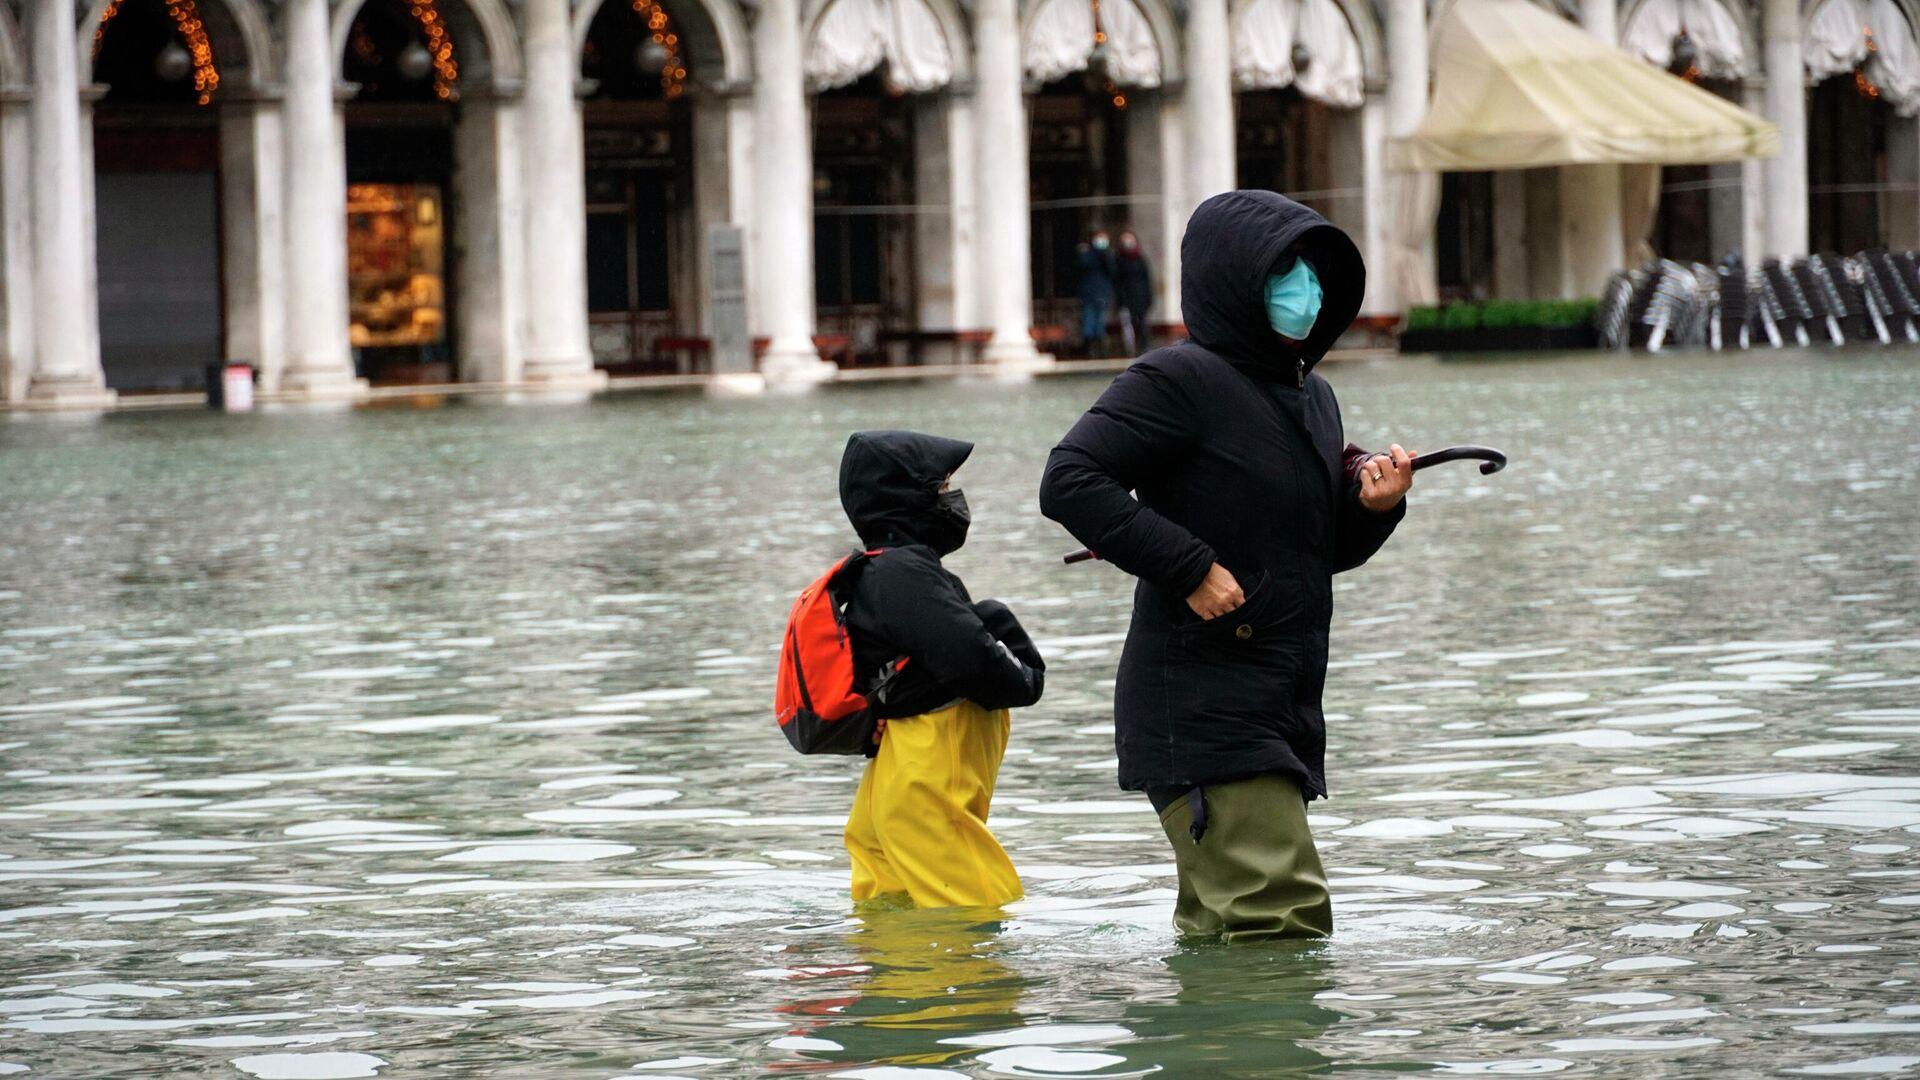 Überschwemmung in Venedig  - SNA, 1920, 09.12.2020